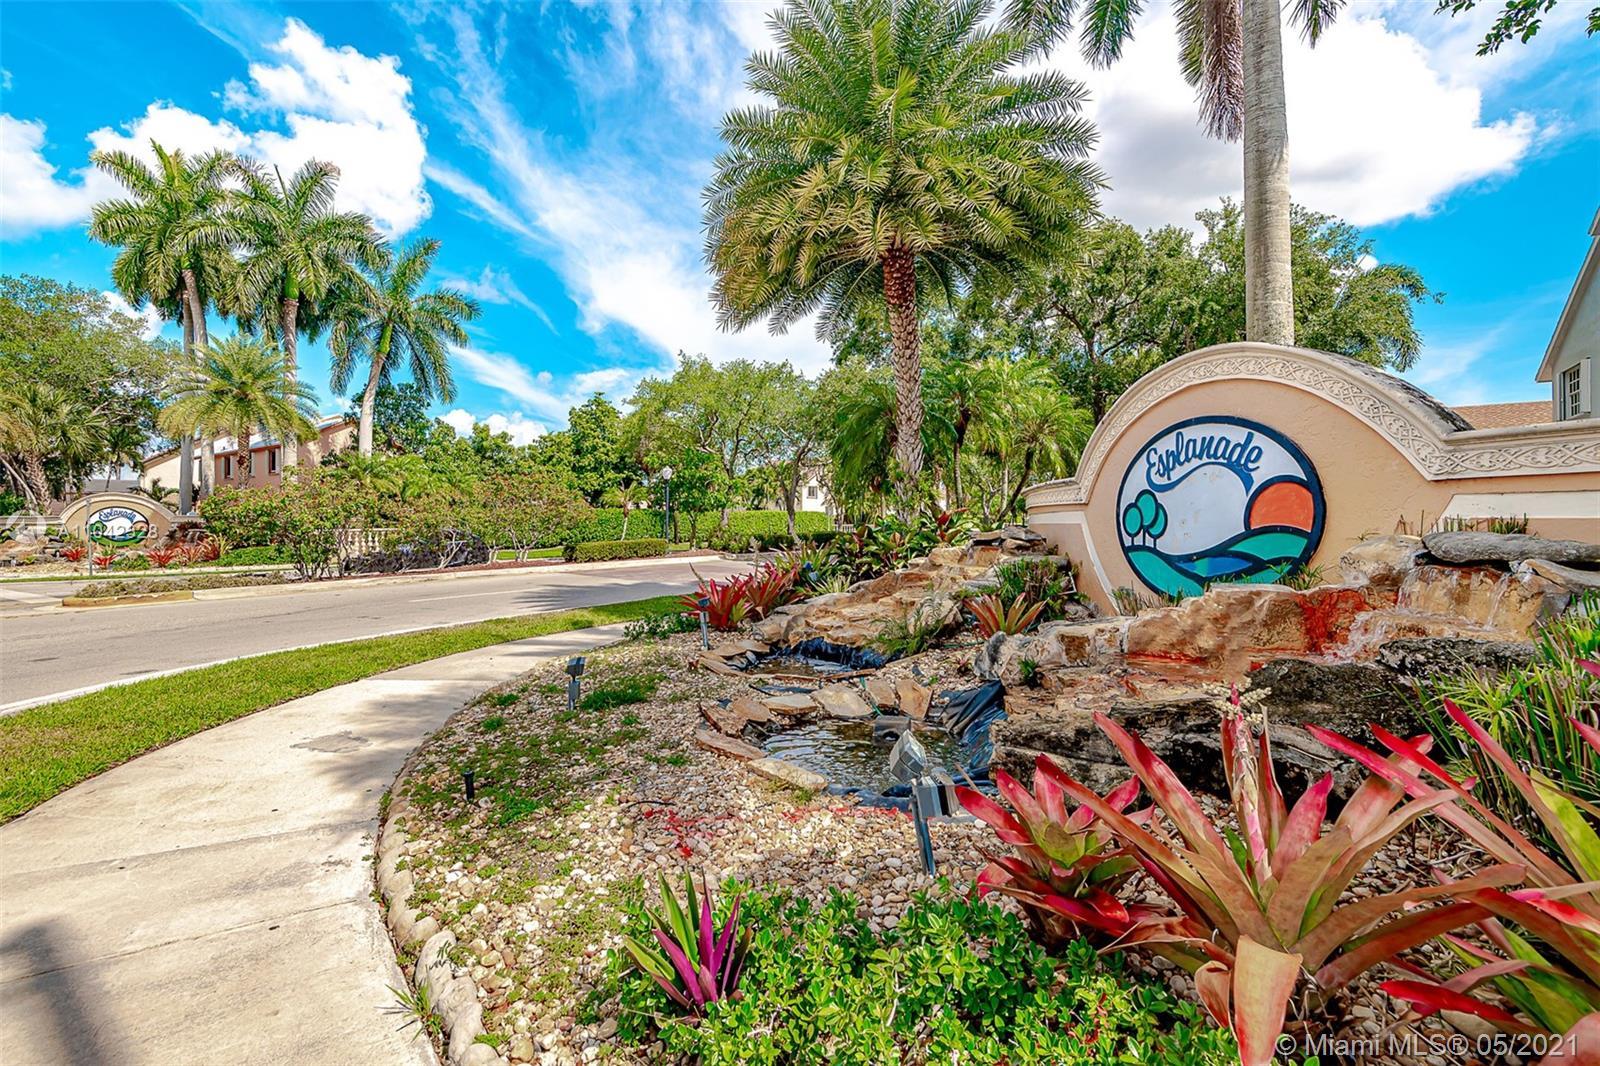 Country Lake Park - 18716 NW 78th Pl, Hialeah, FL 33015